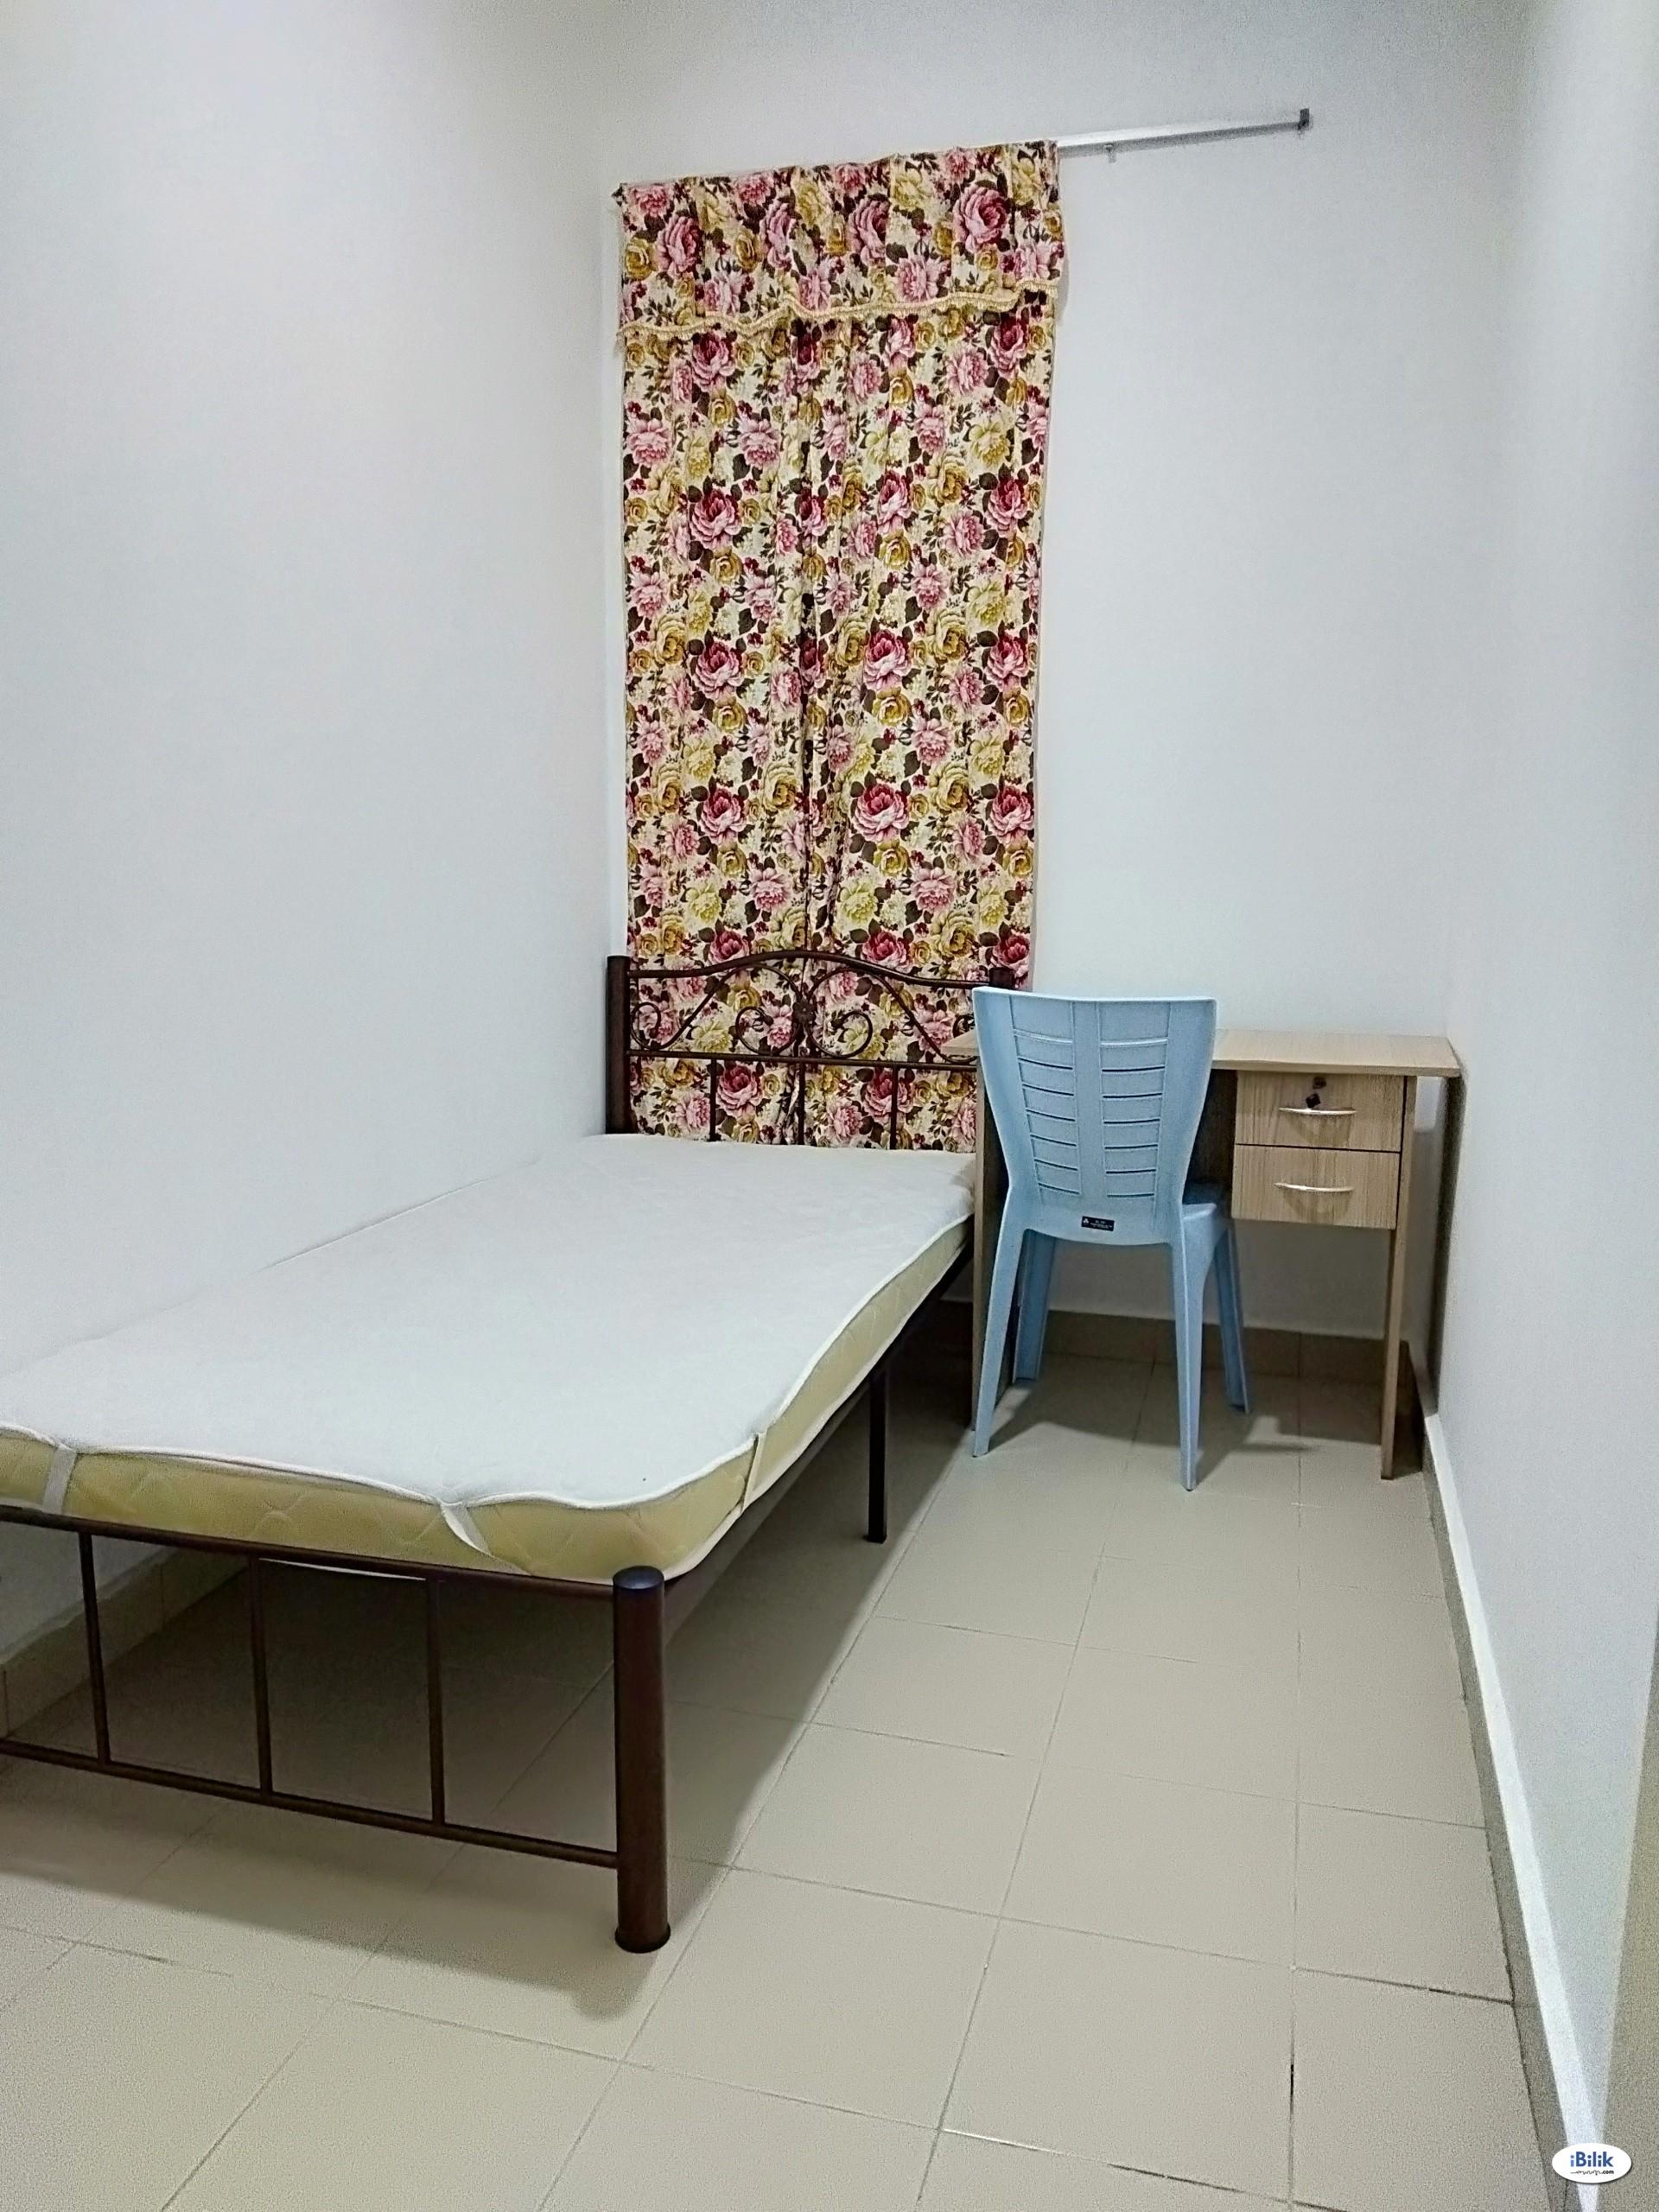 Univ 360 Place Seri Kembangan Single Room For Rent, Nearby Taman Bukit Serdang Jaya, The Mines